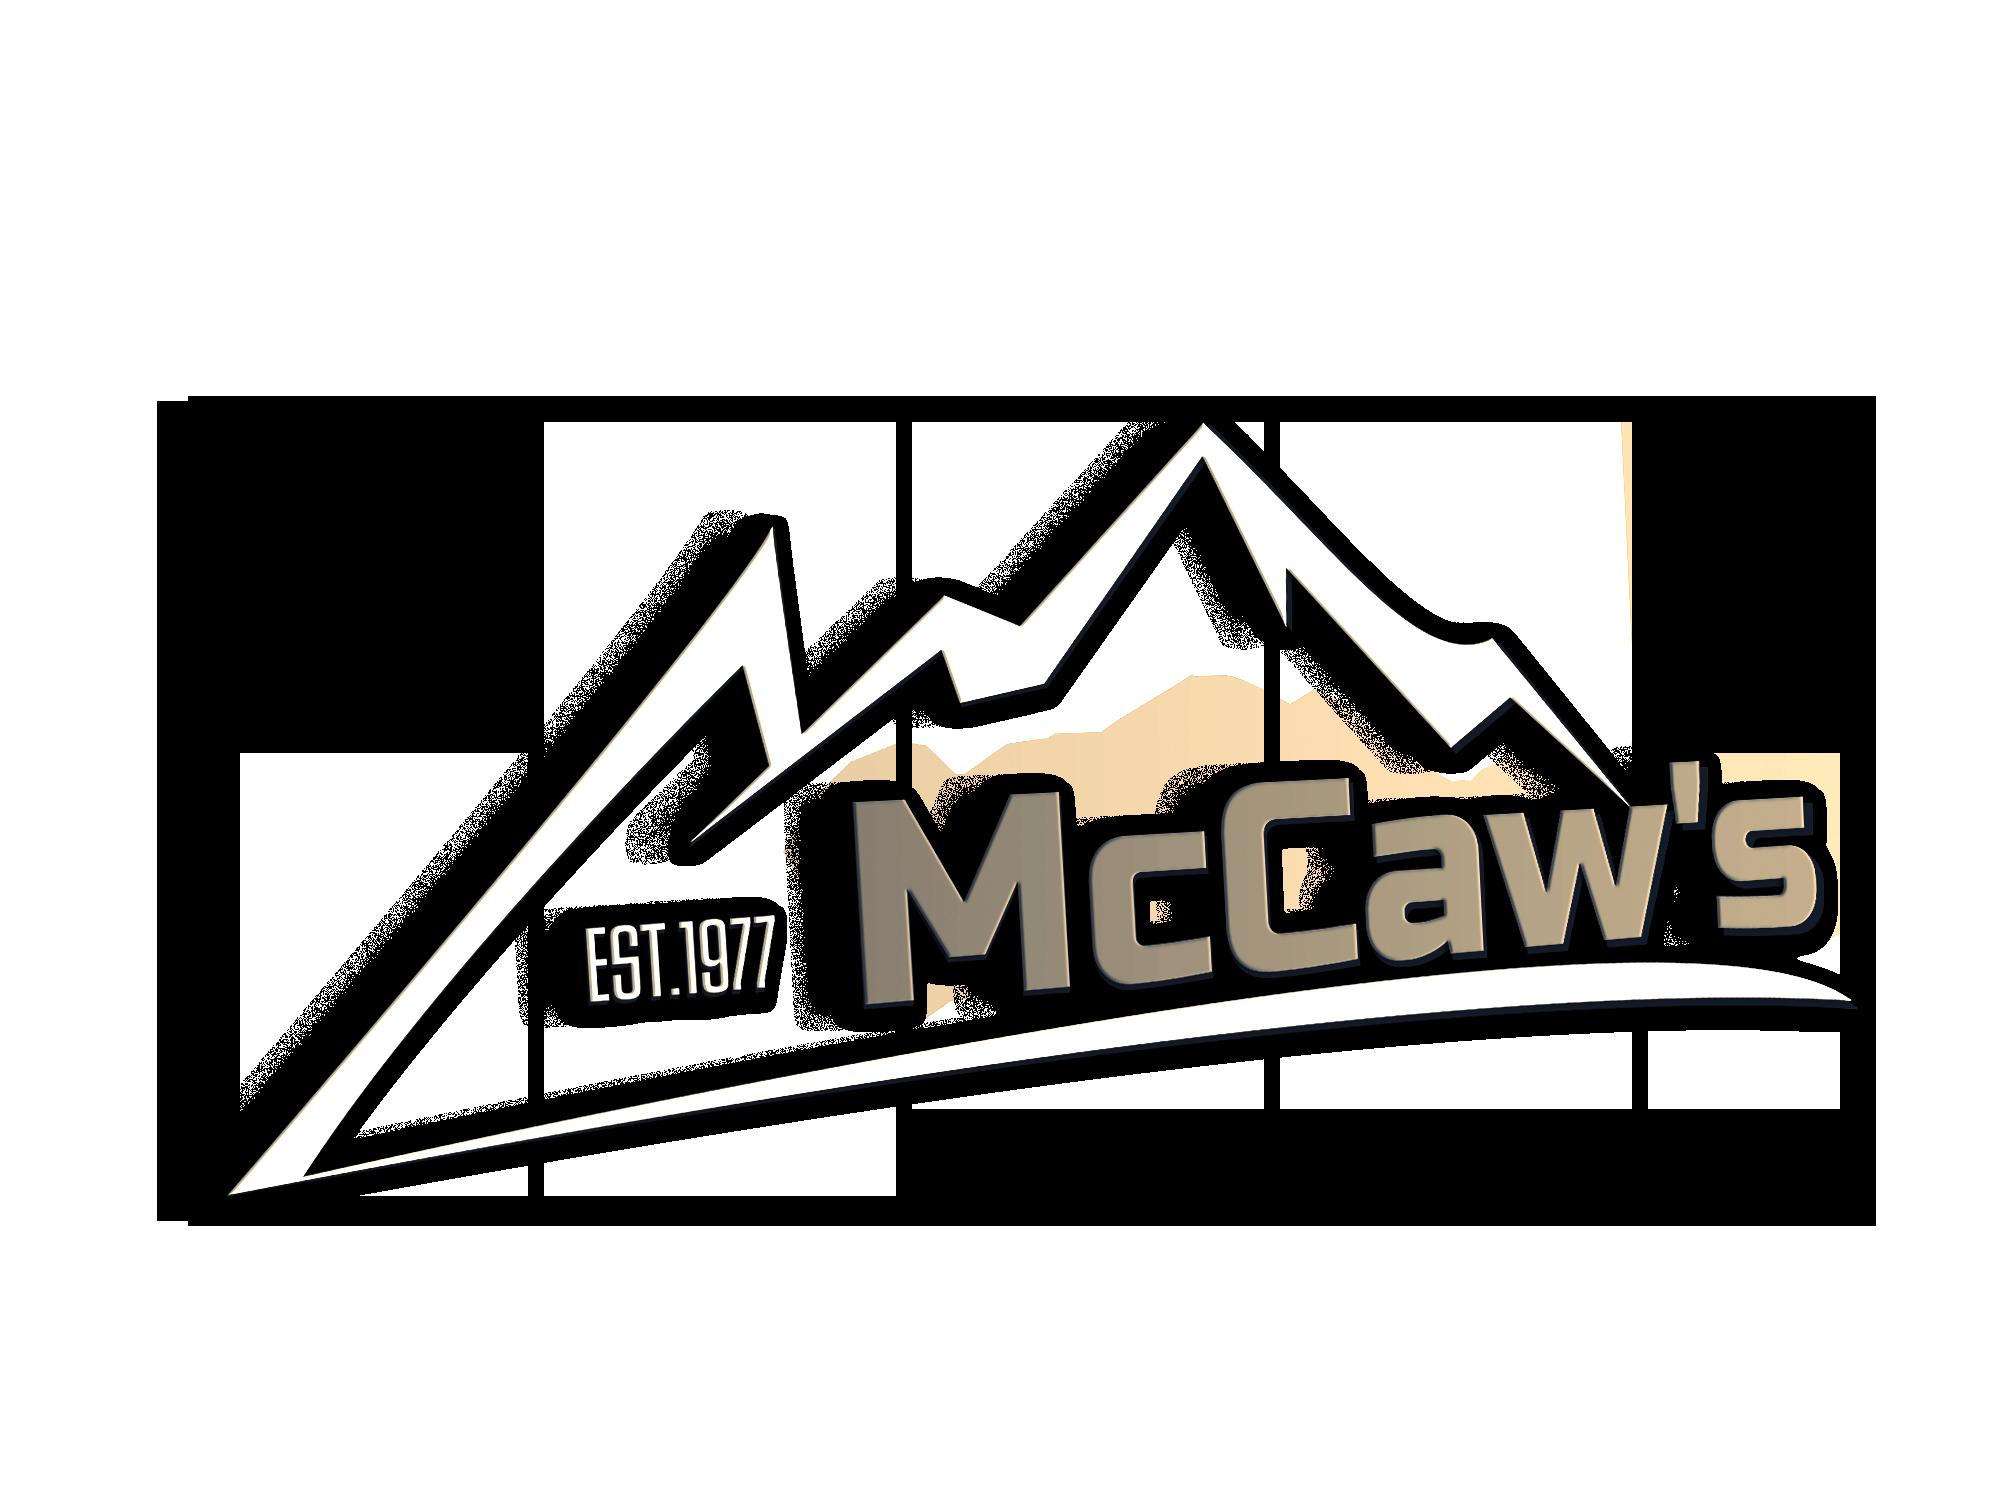 McCaw's Drilling & Blasting Ltd logo